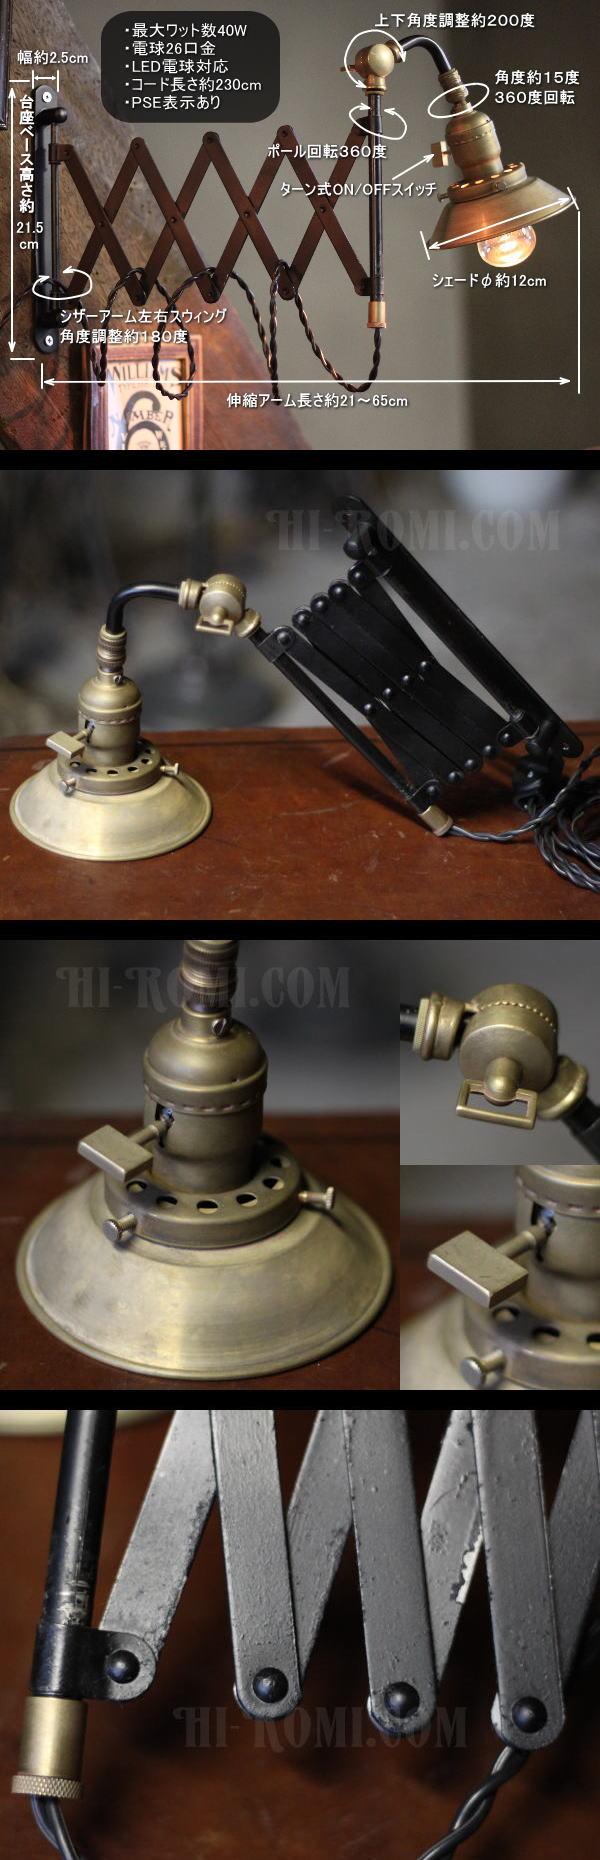 USAヴィンテージ工業系真鍮シェード付角度調整付シザーアーム蛇腹ブラケットランプA/アンティーク照明 アンティーク照明&雑貨 Hi-Romi.com 神戸